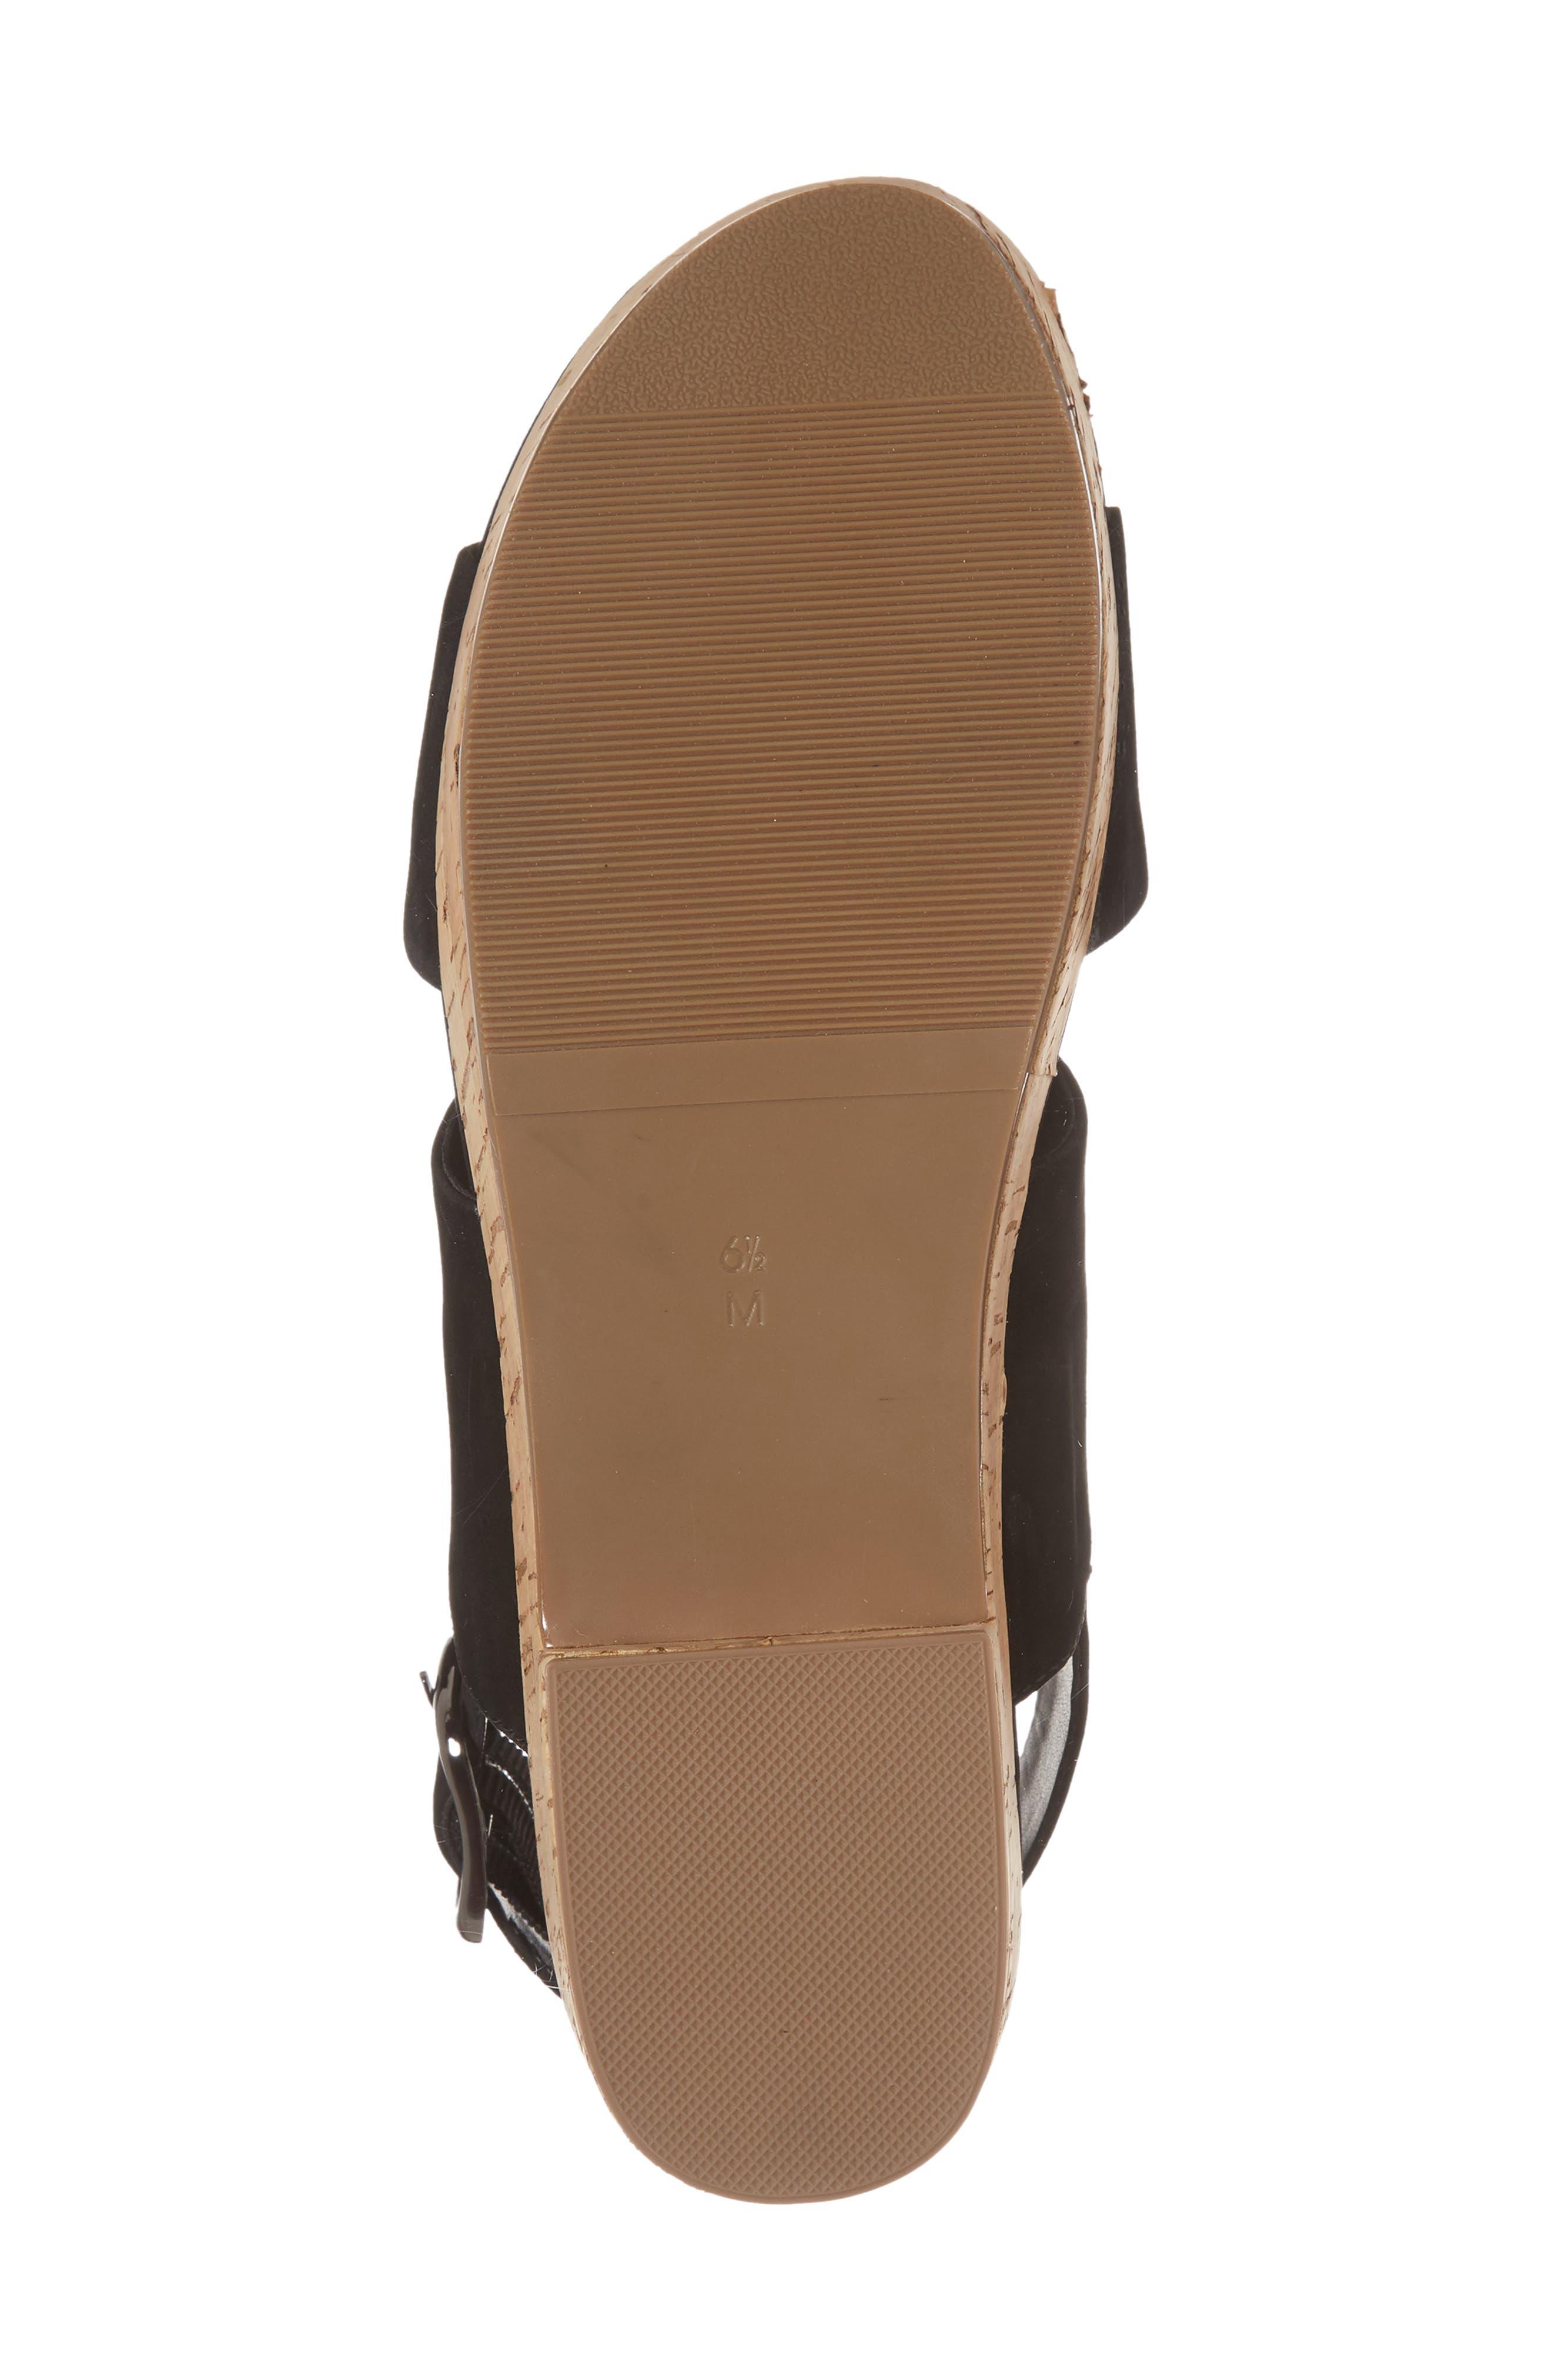 Safty Slingback Sandal,                             Alternate thumbnail 11, color,